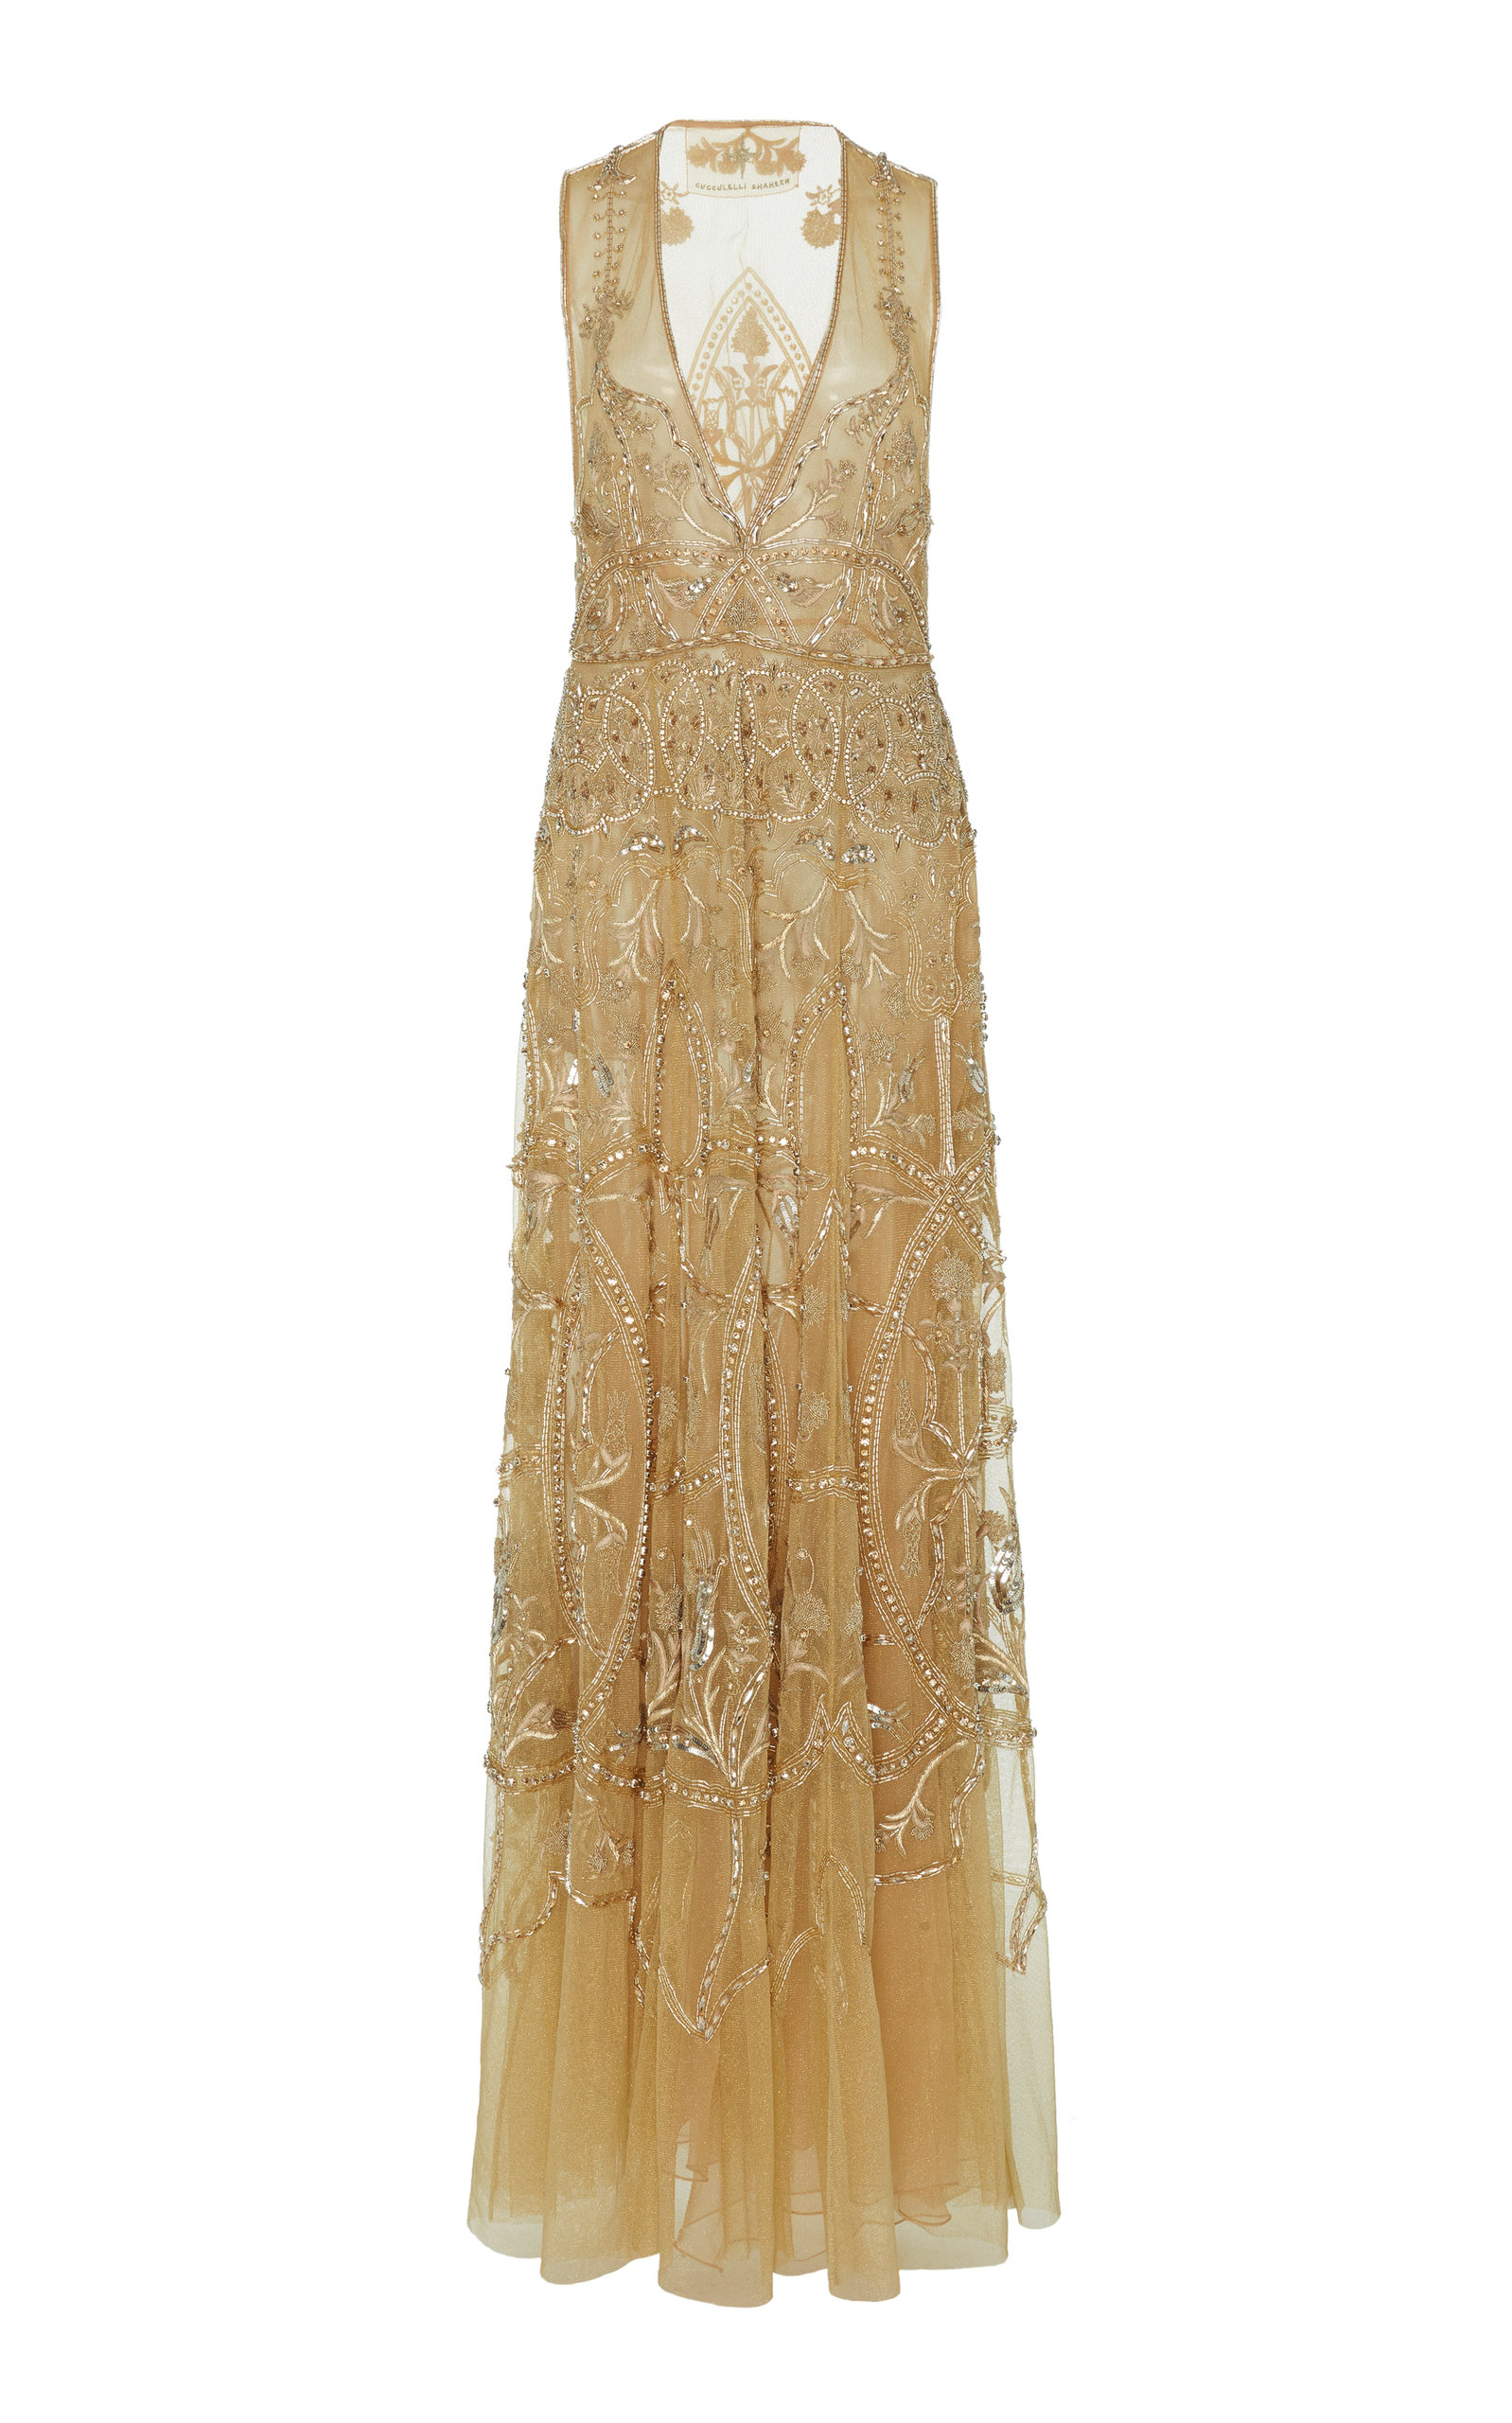 Helios Full Skirted Dress Cucculelli Shaheen 0DRc1s5y